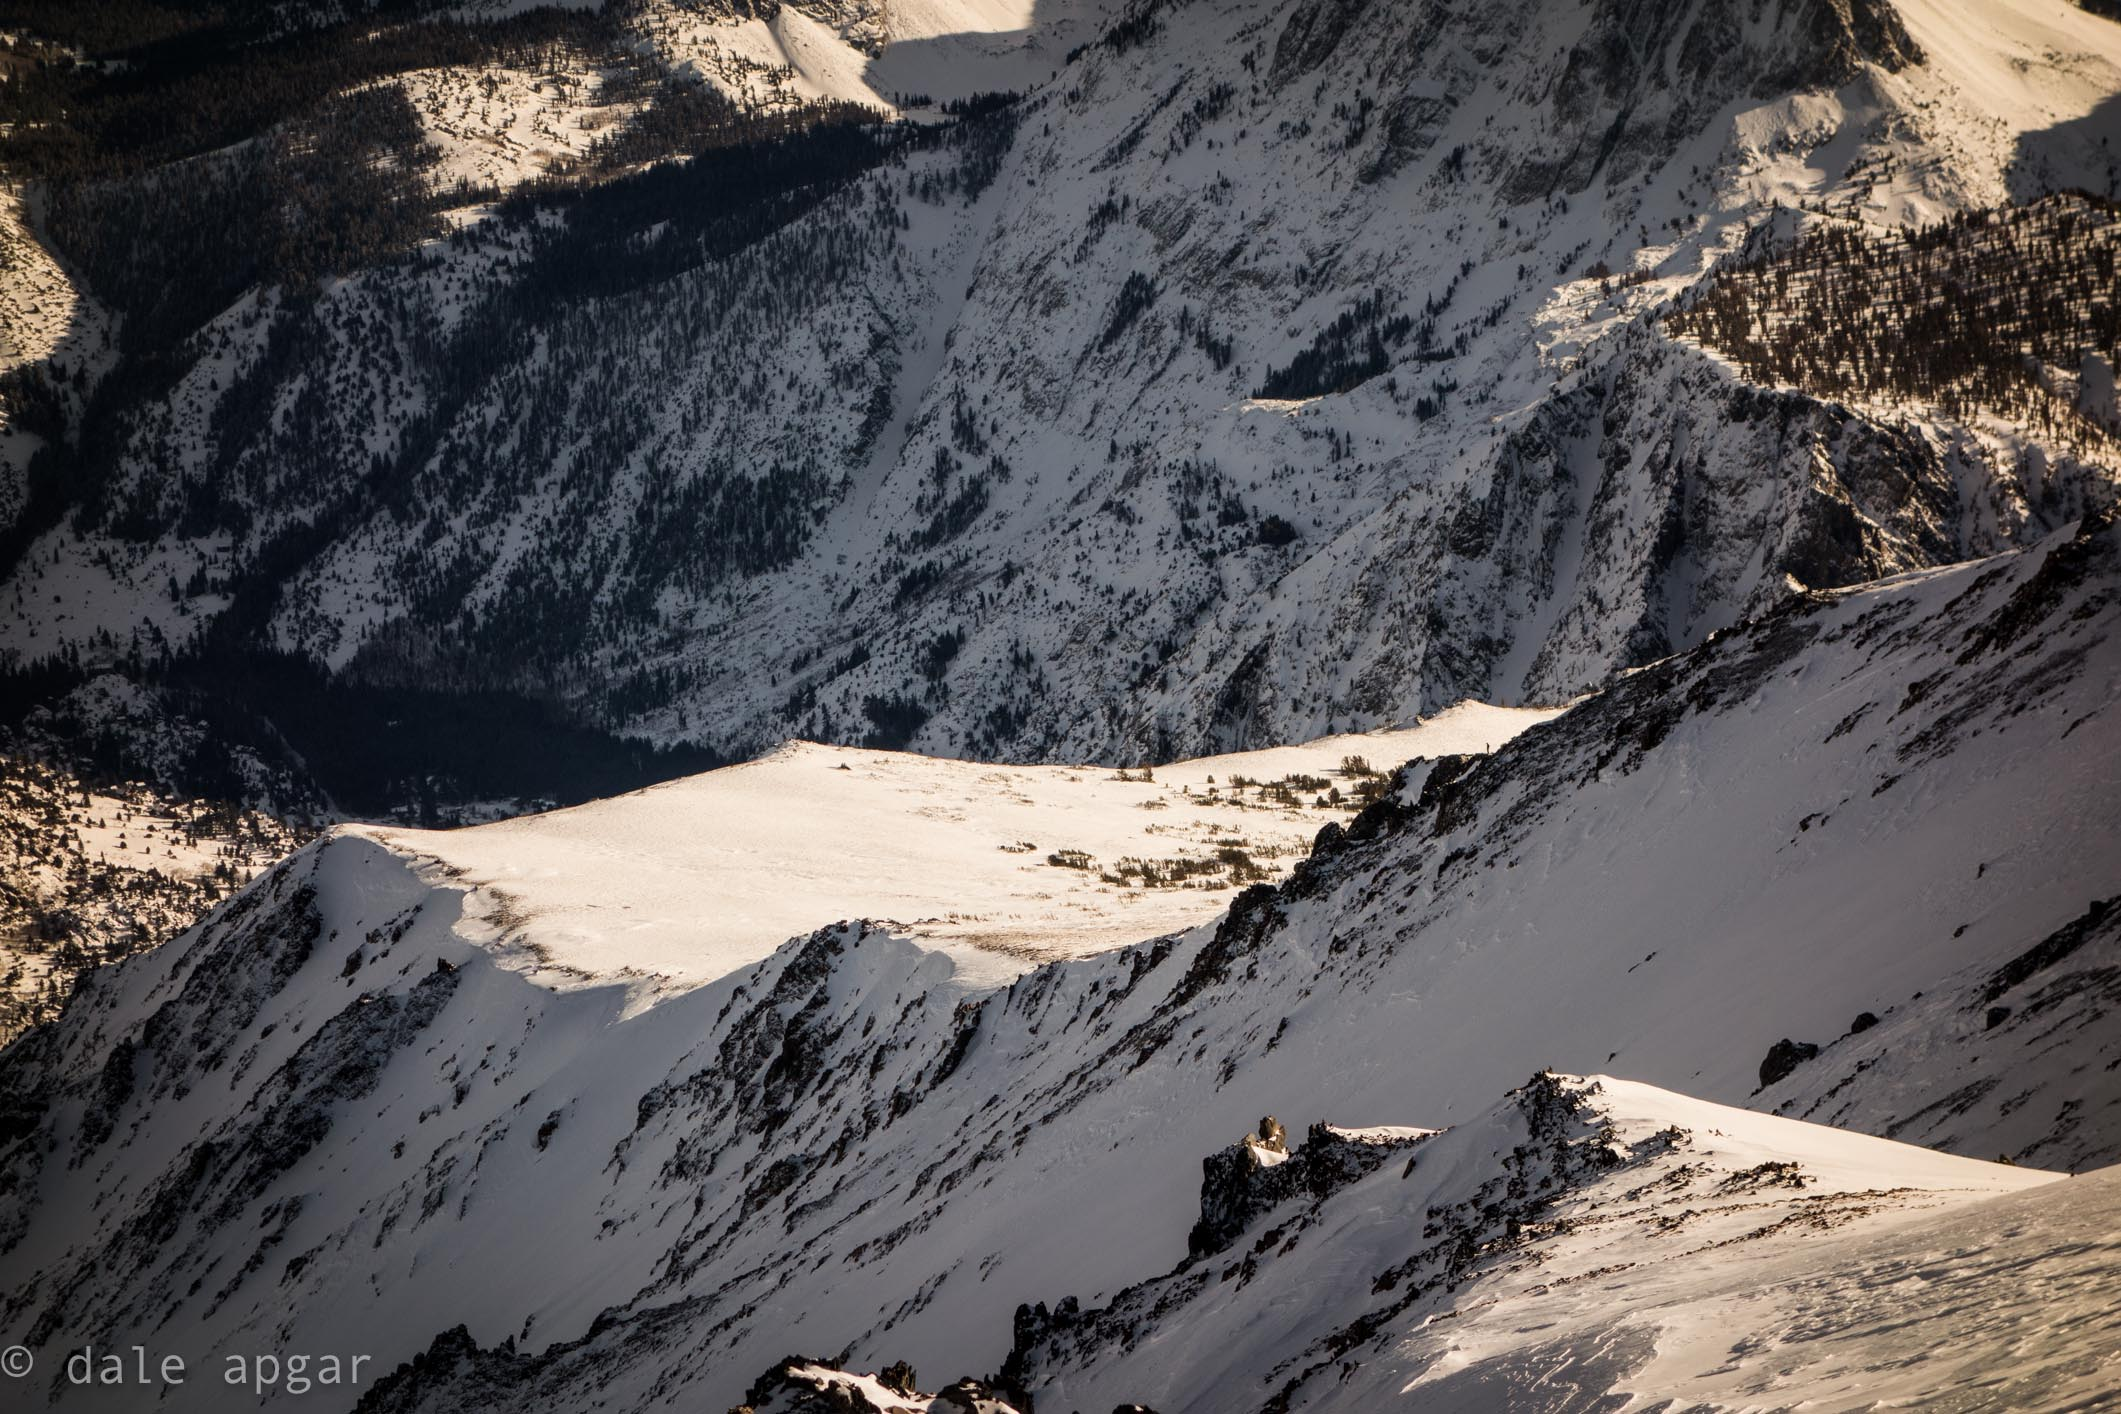 dale_apgar_ski-21.jpg